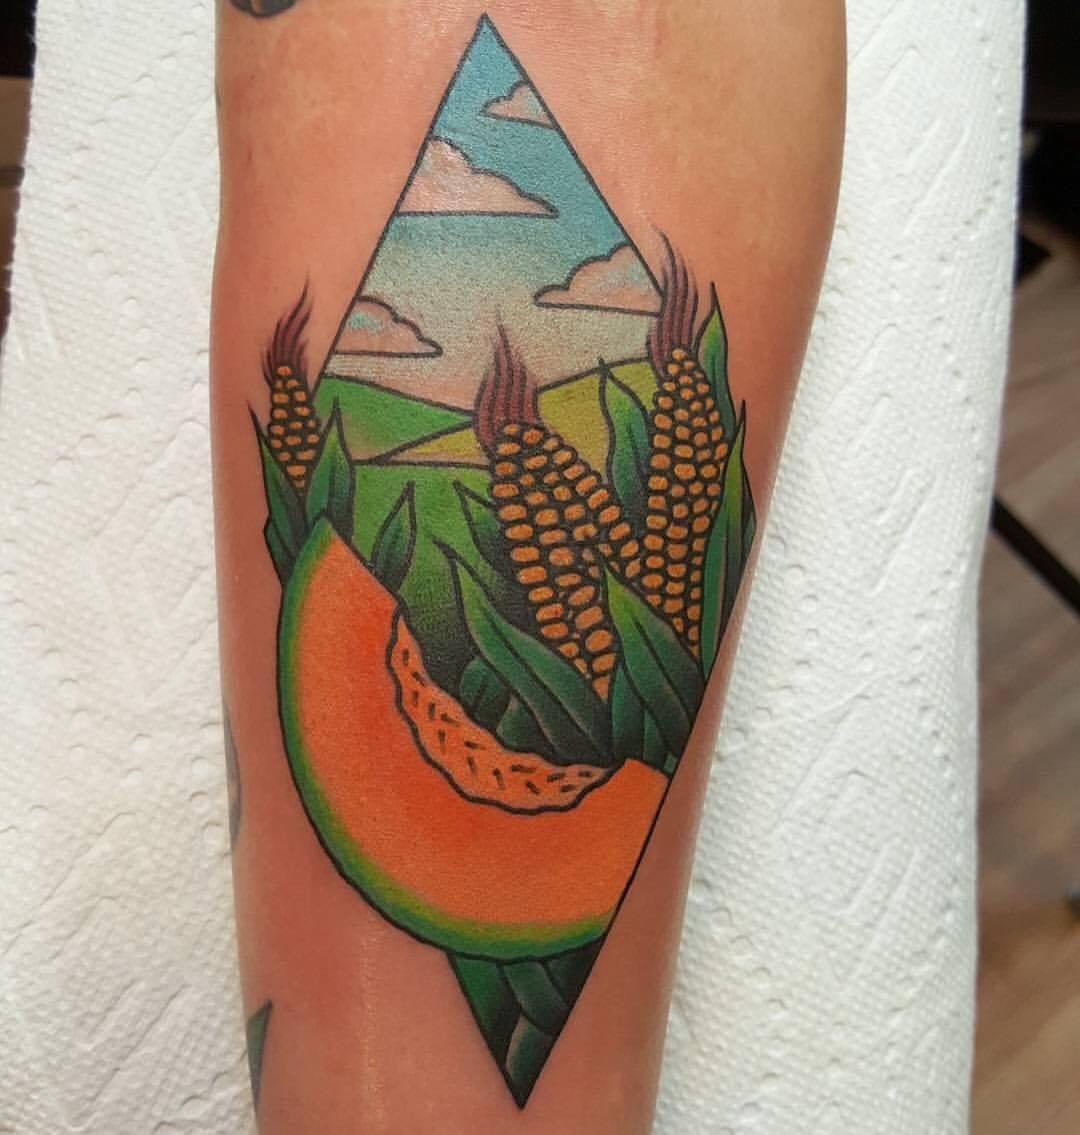 tatuaje-maiz-melon-comida-mexicana